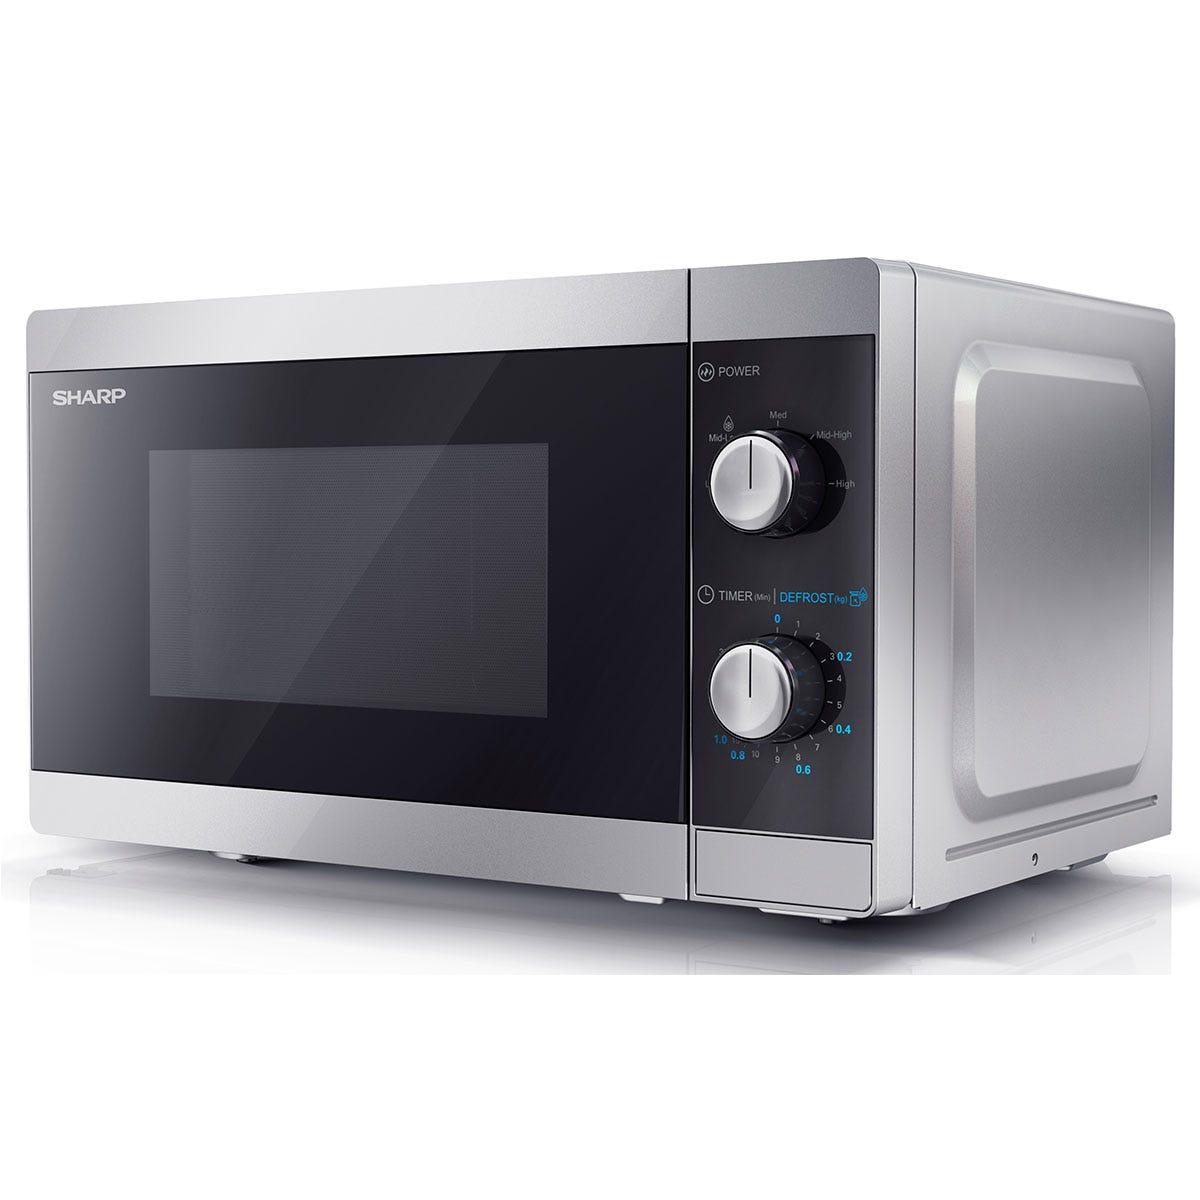 Sharp YC-MS01U-S 800W 20L Solo Microwave - Silver